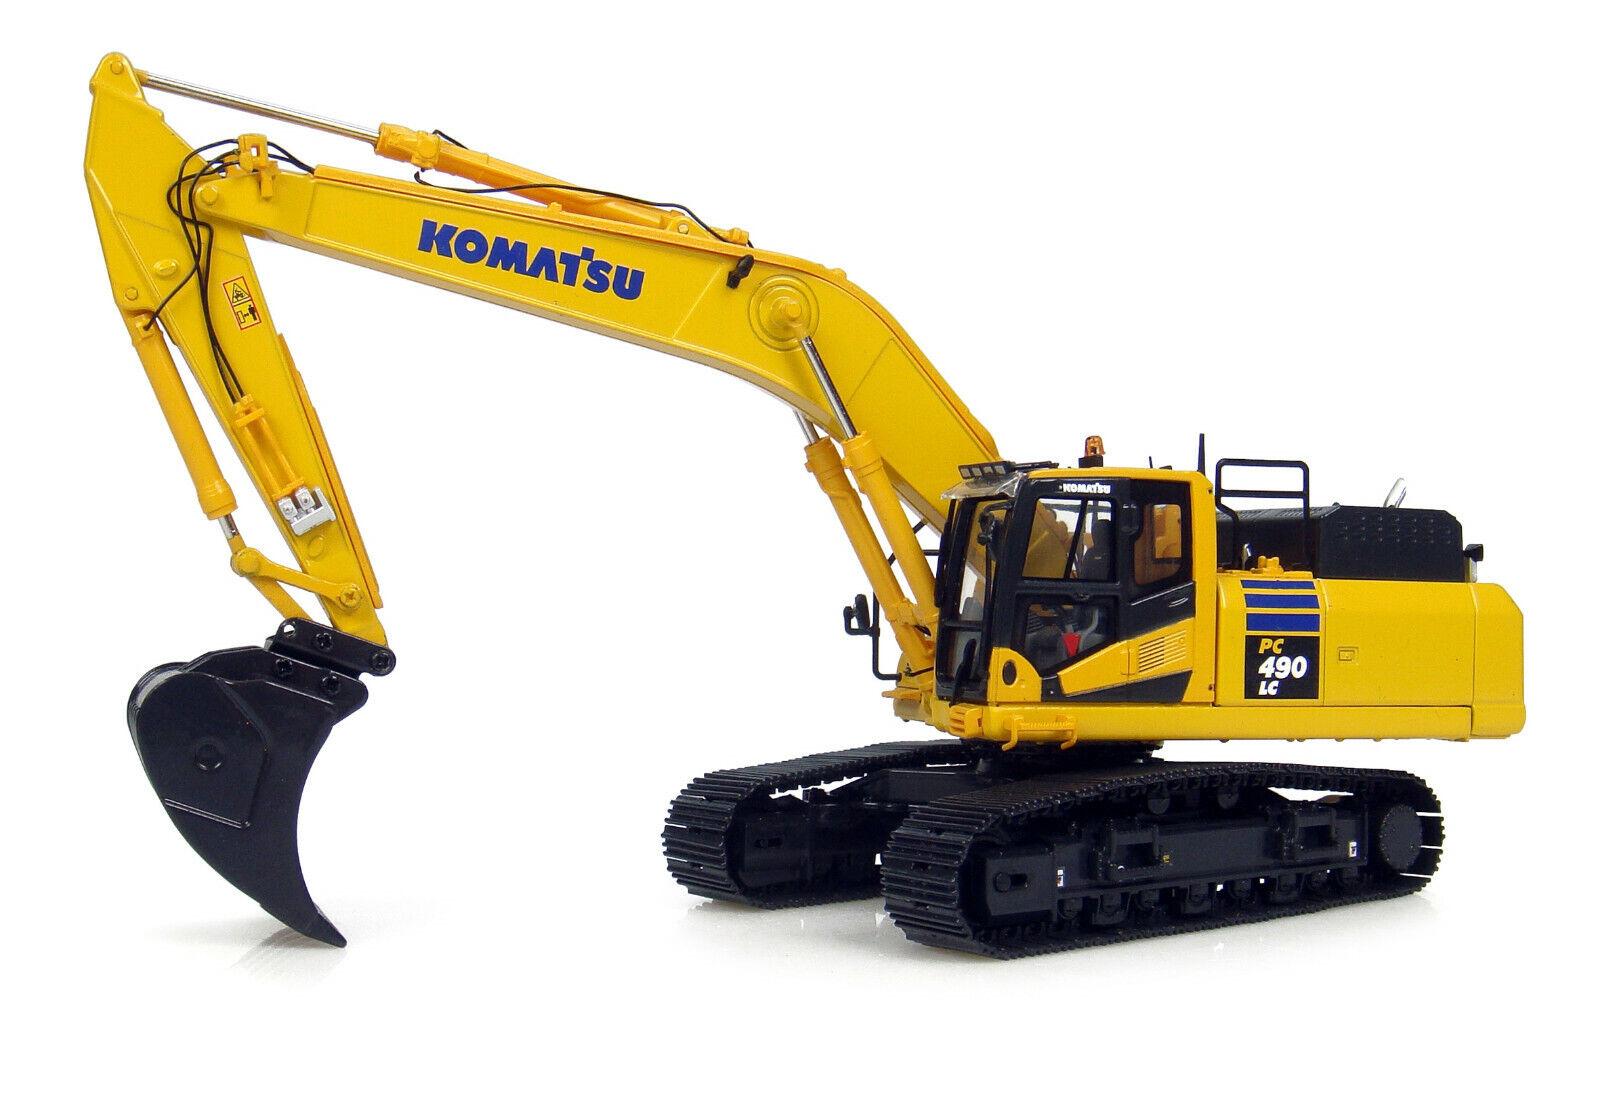 Komatsu PC490LC-10 chenilles Excavatrice 1 50 diecast modèle Universal Hobbies UH8090